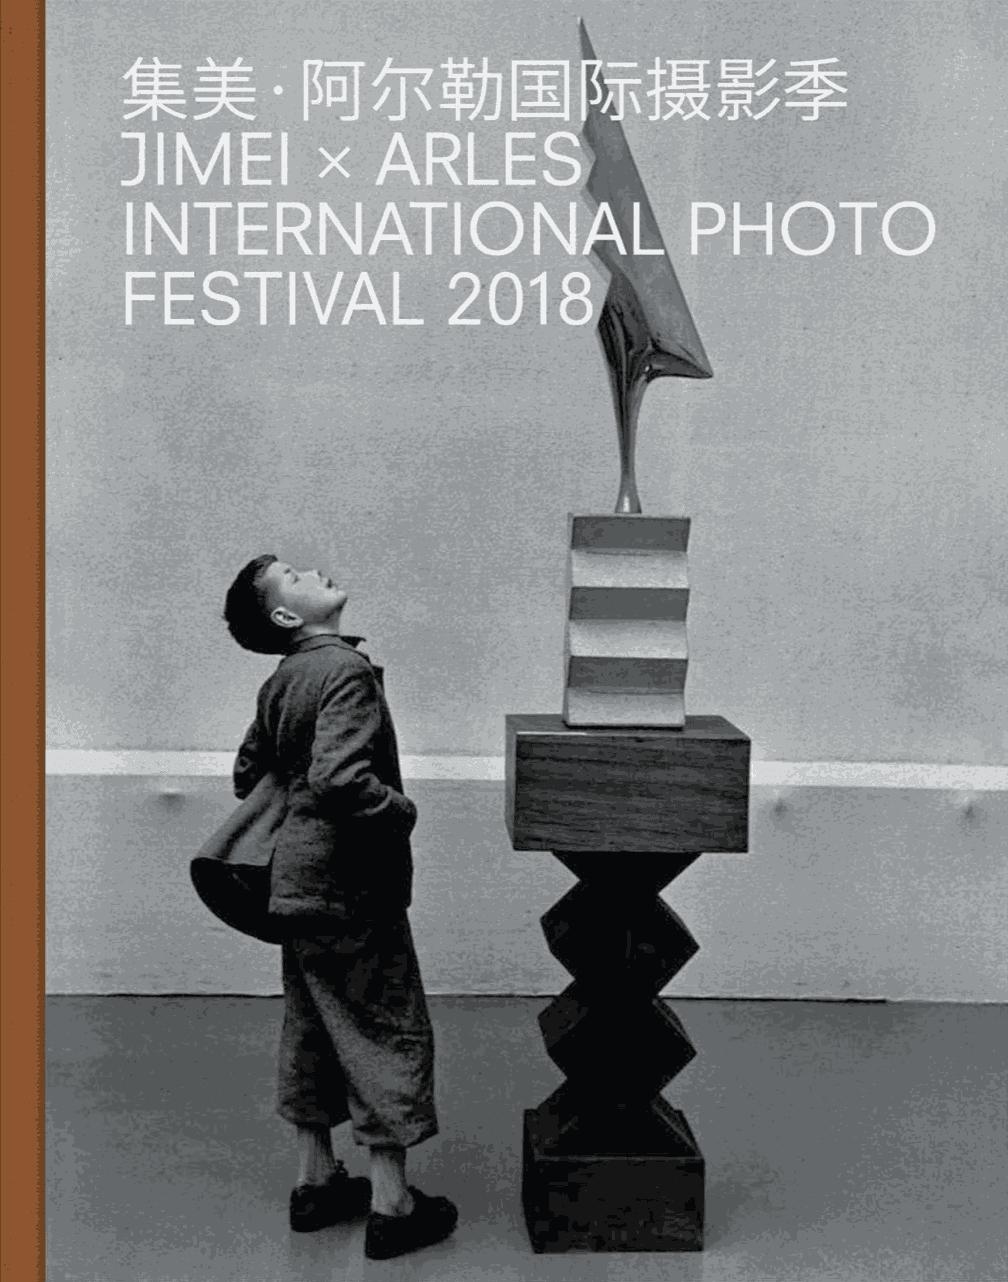 JIMEI × ARLES INTERNATIONAL PHOTO FESTIVAL Catalogue 2018